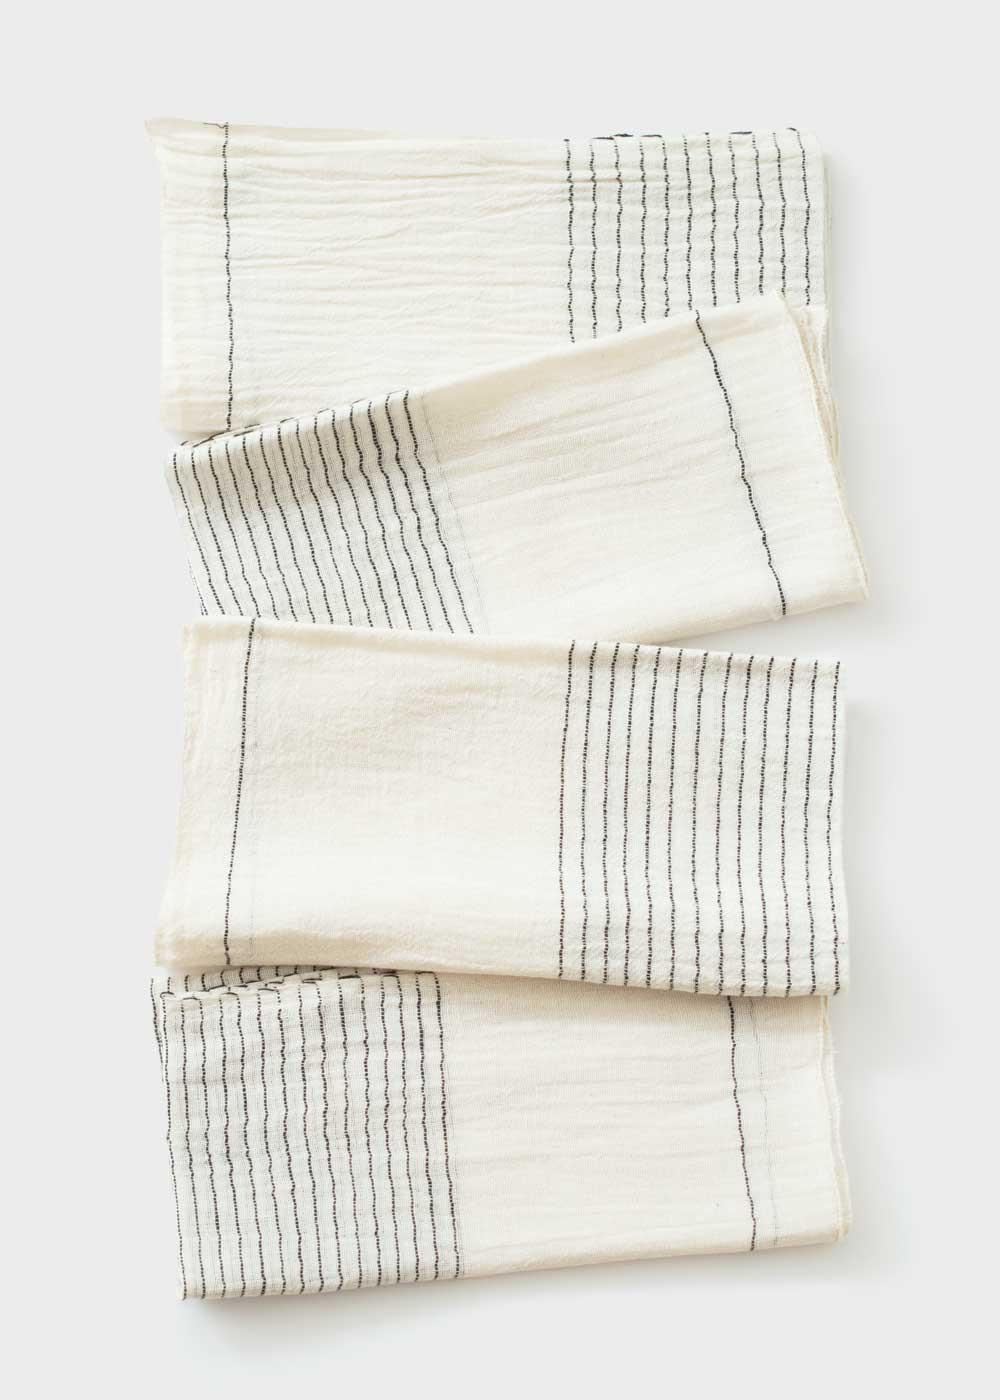 Roha Cotton Napkins